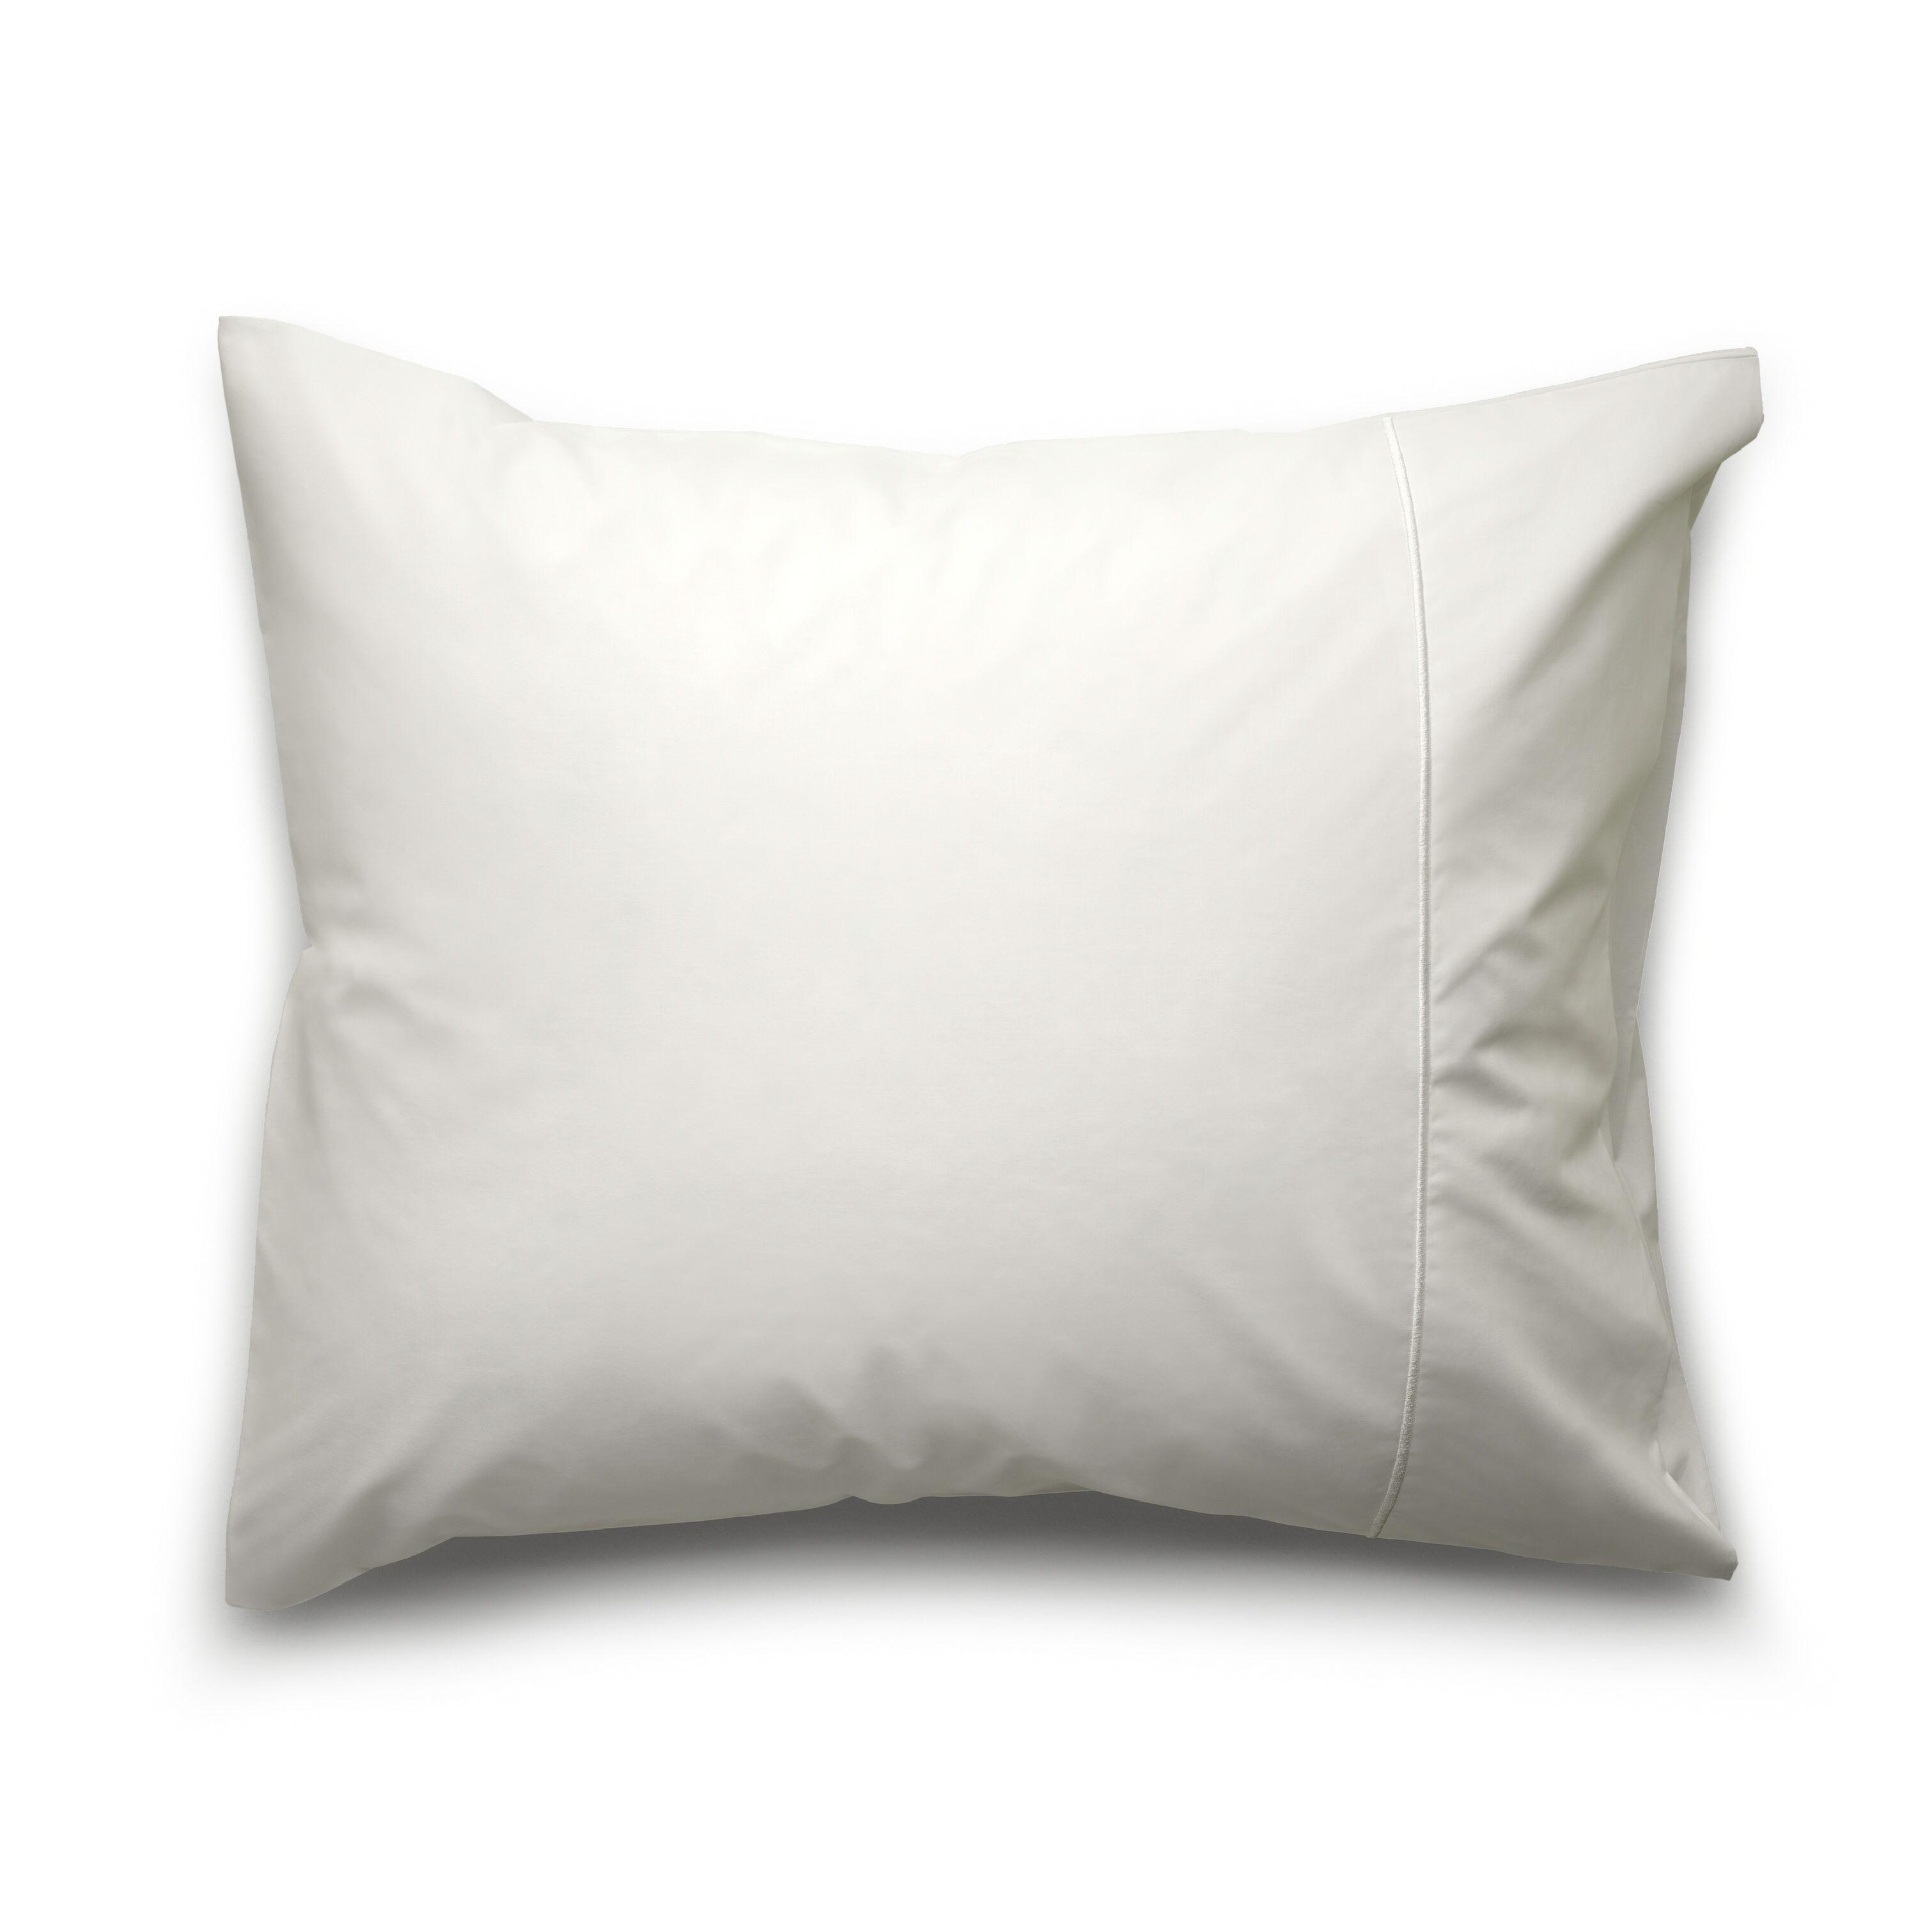 https www hastens com en nl childrens pure white pillow case childrenspurewhitepillowcase html